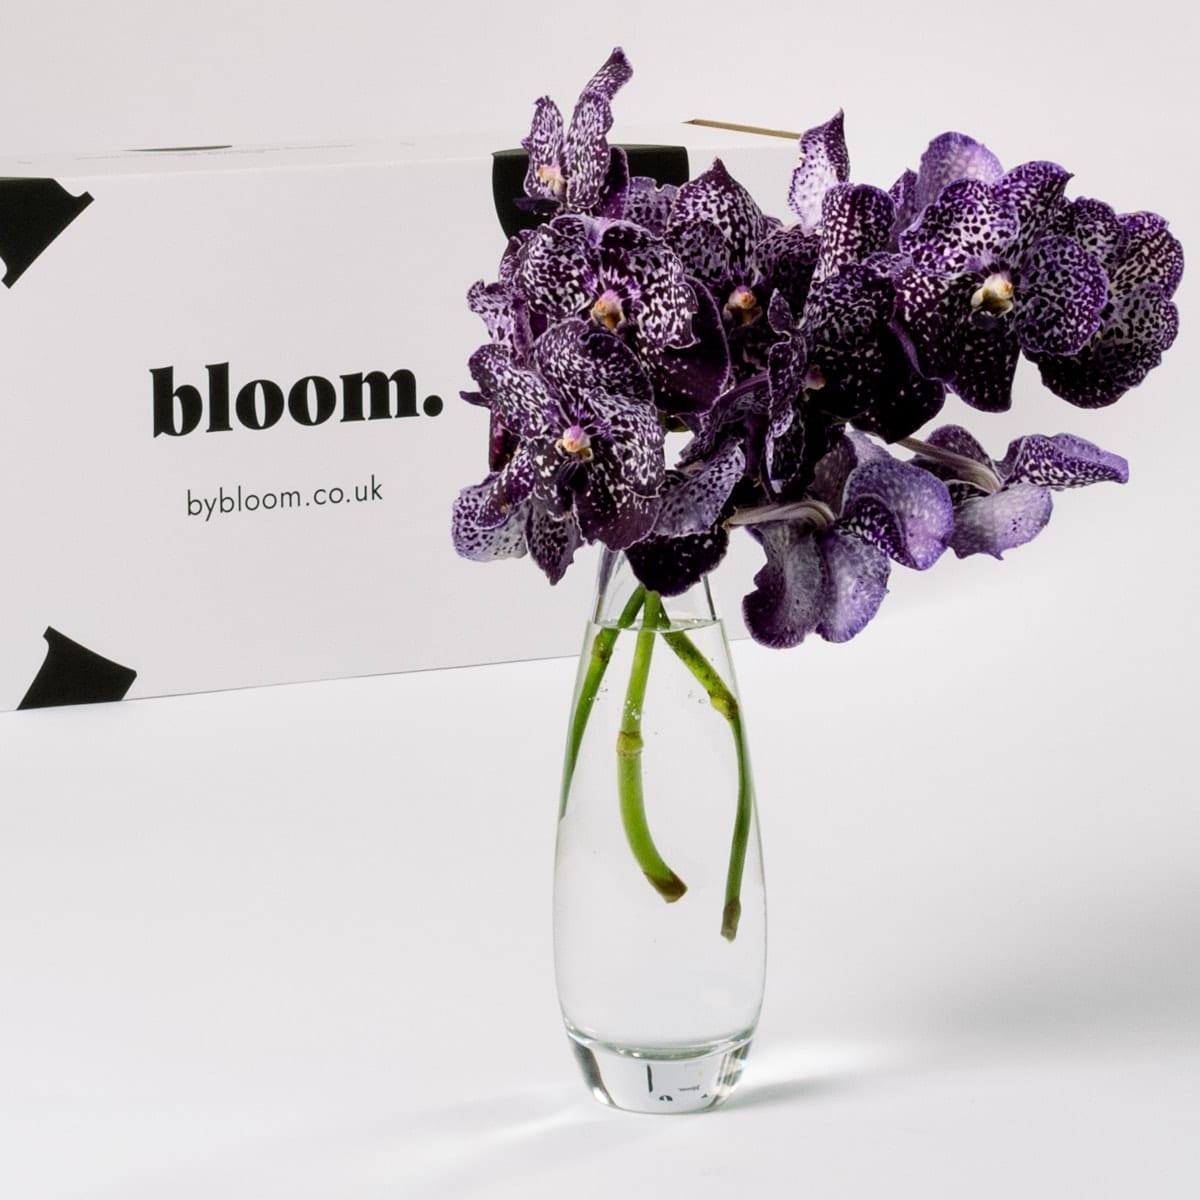 Bloom Flower Delivery | Purple Magic Vanda Orchid